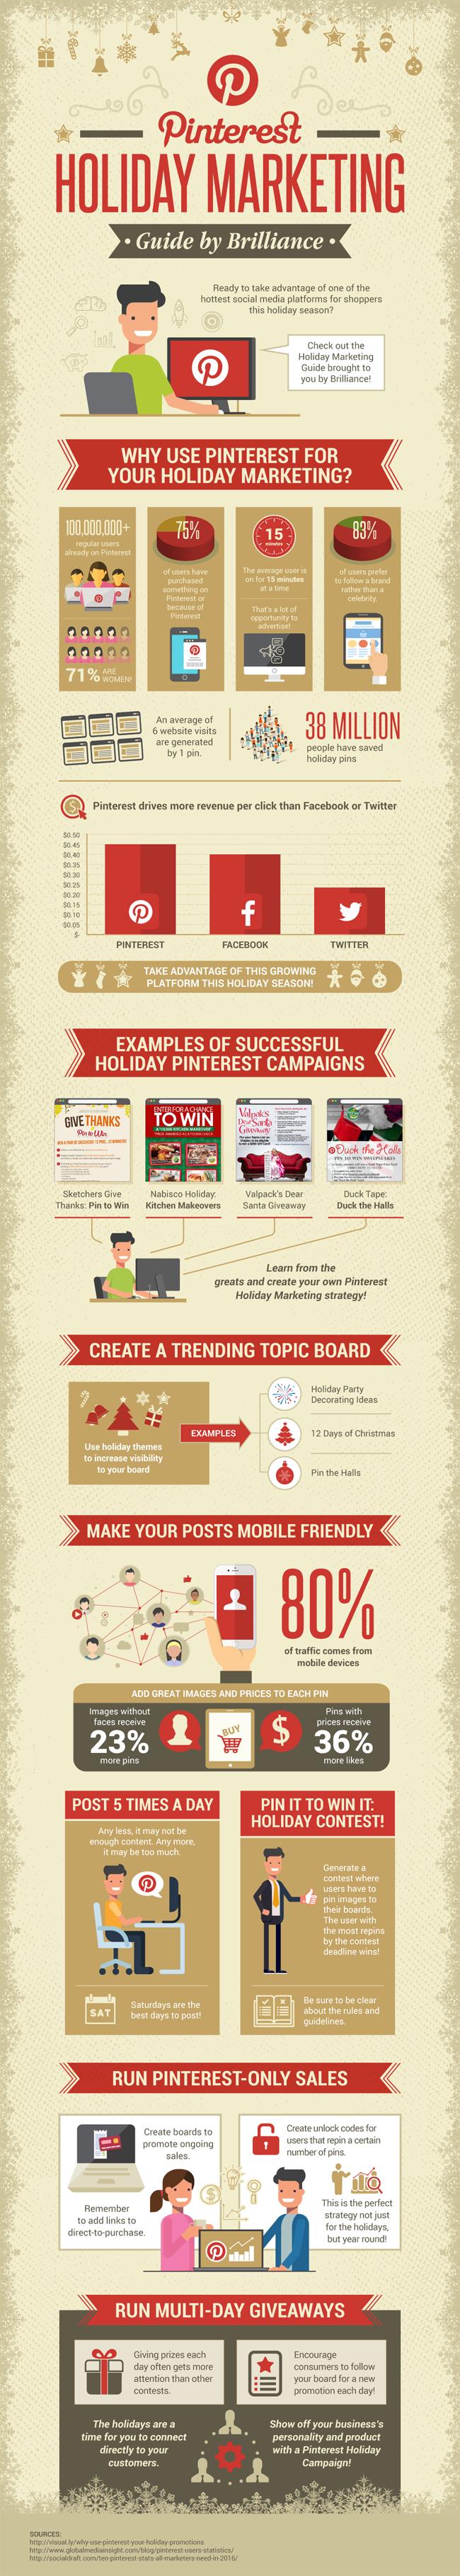 Pinterest Holiday Marketing